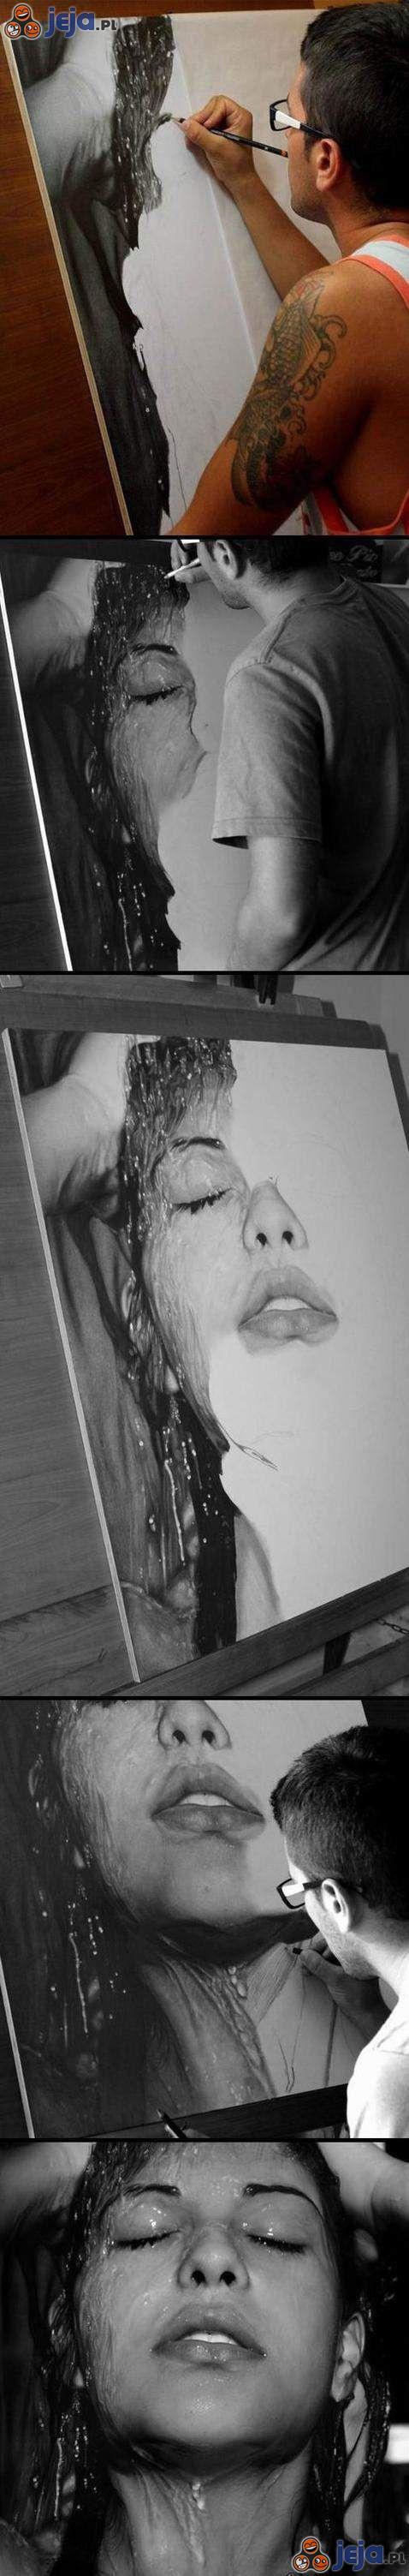 Fotorealistyczny rysunek